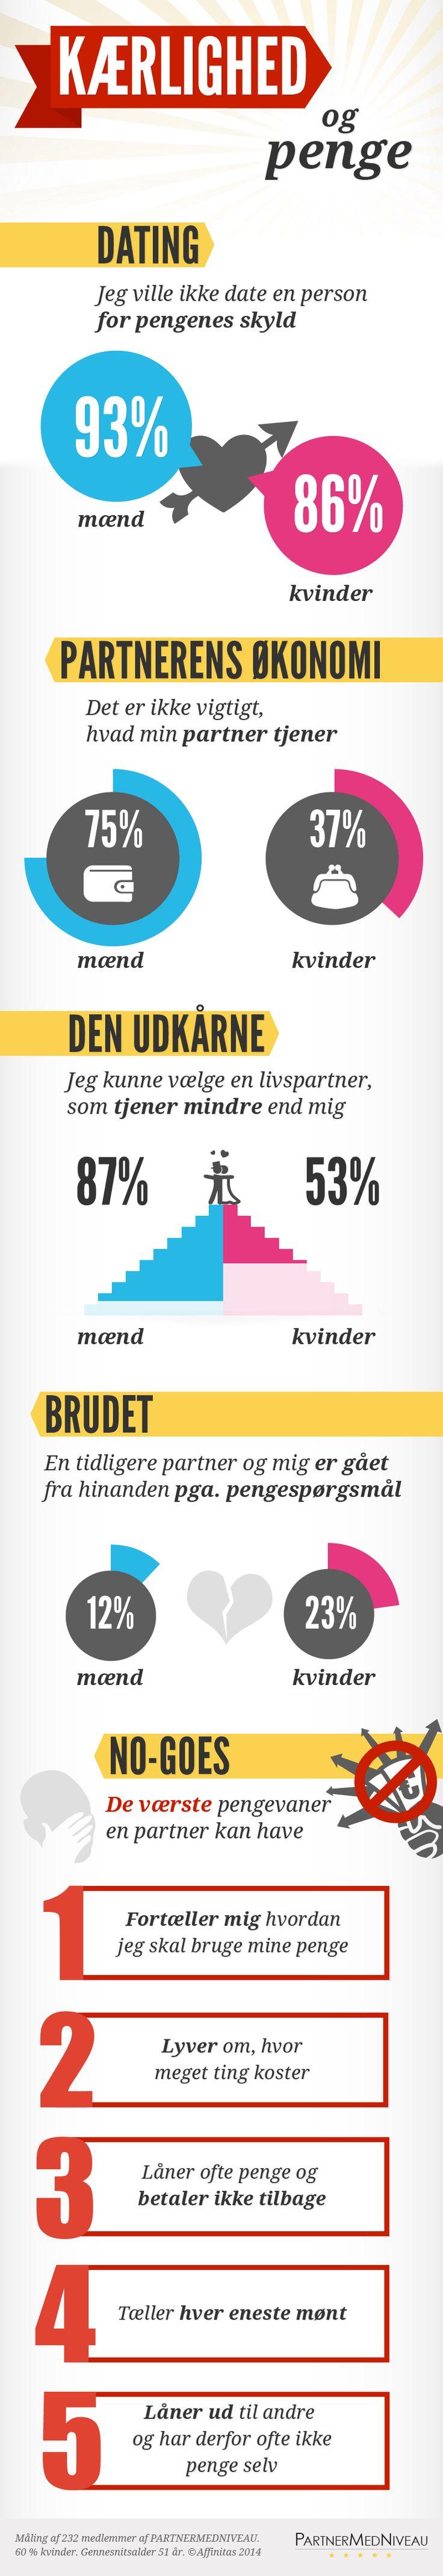 partnermedniveau.dk Randers